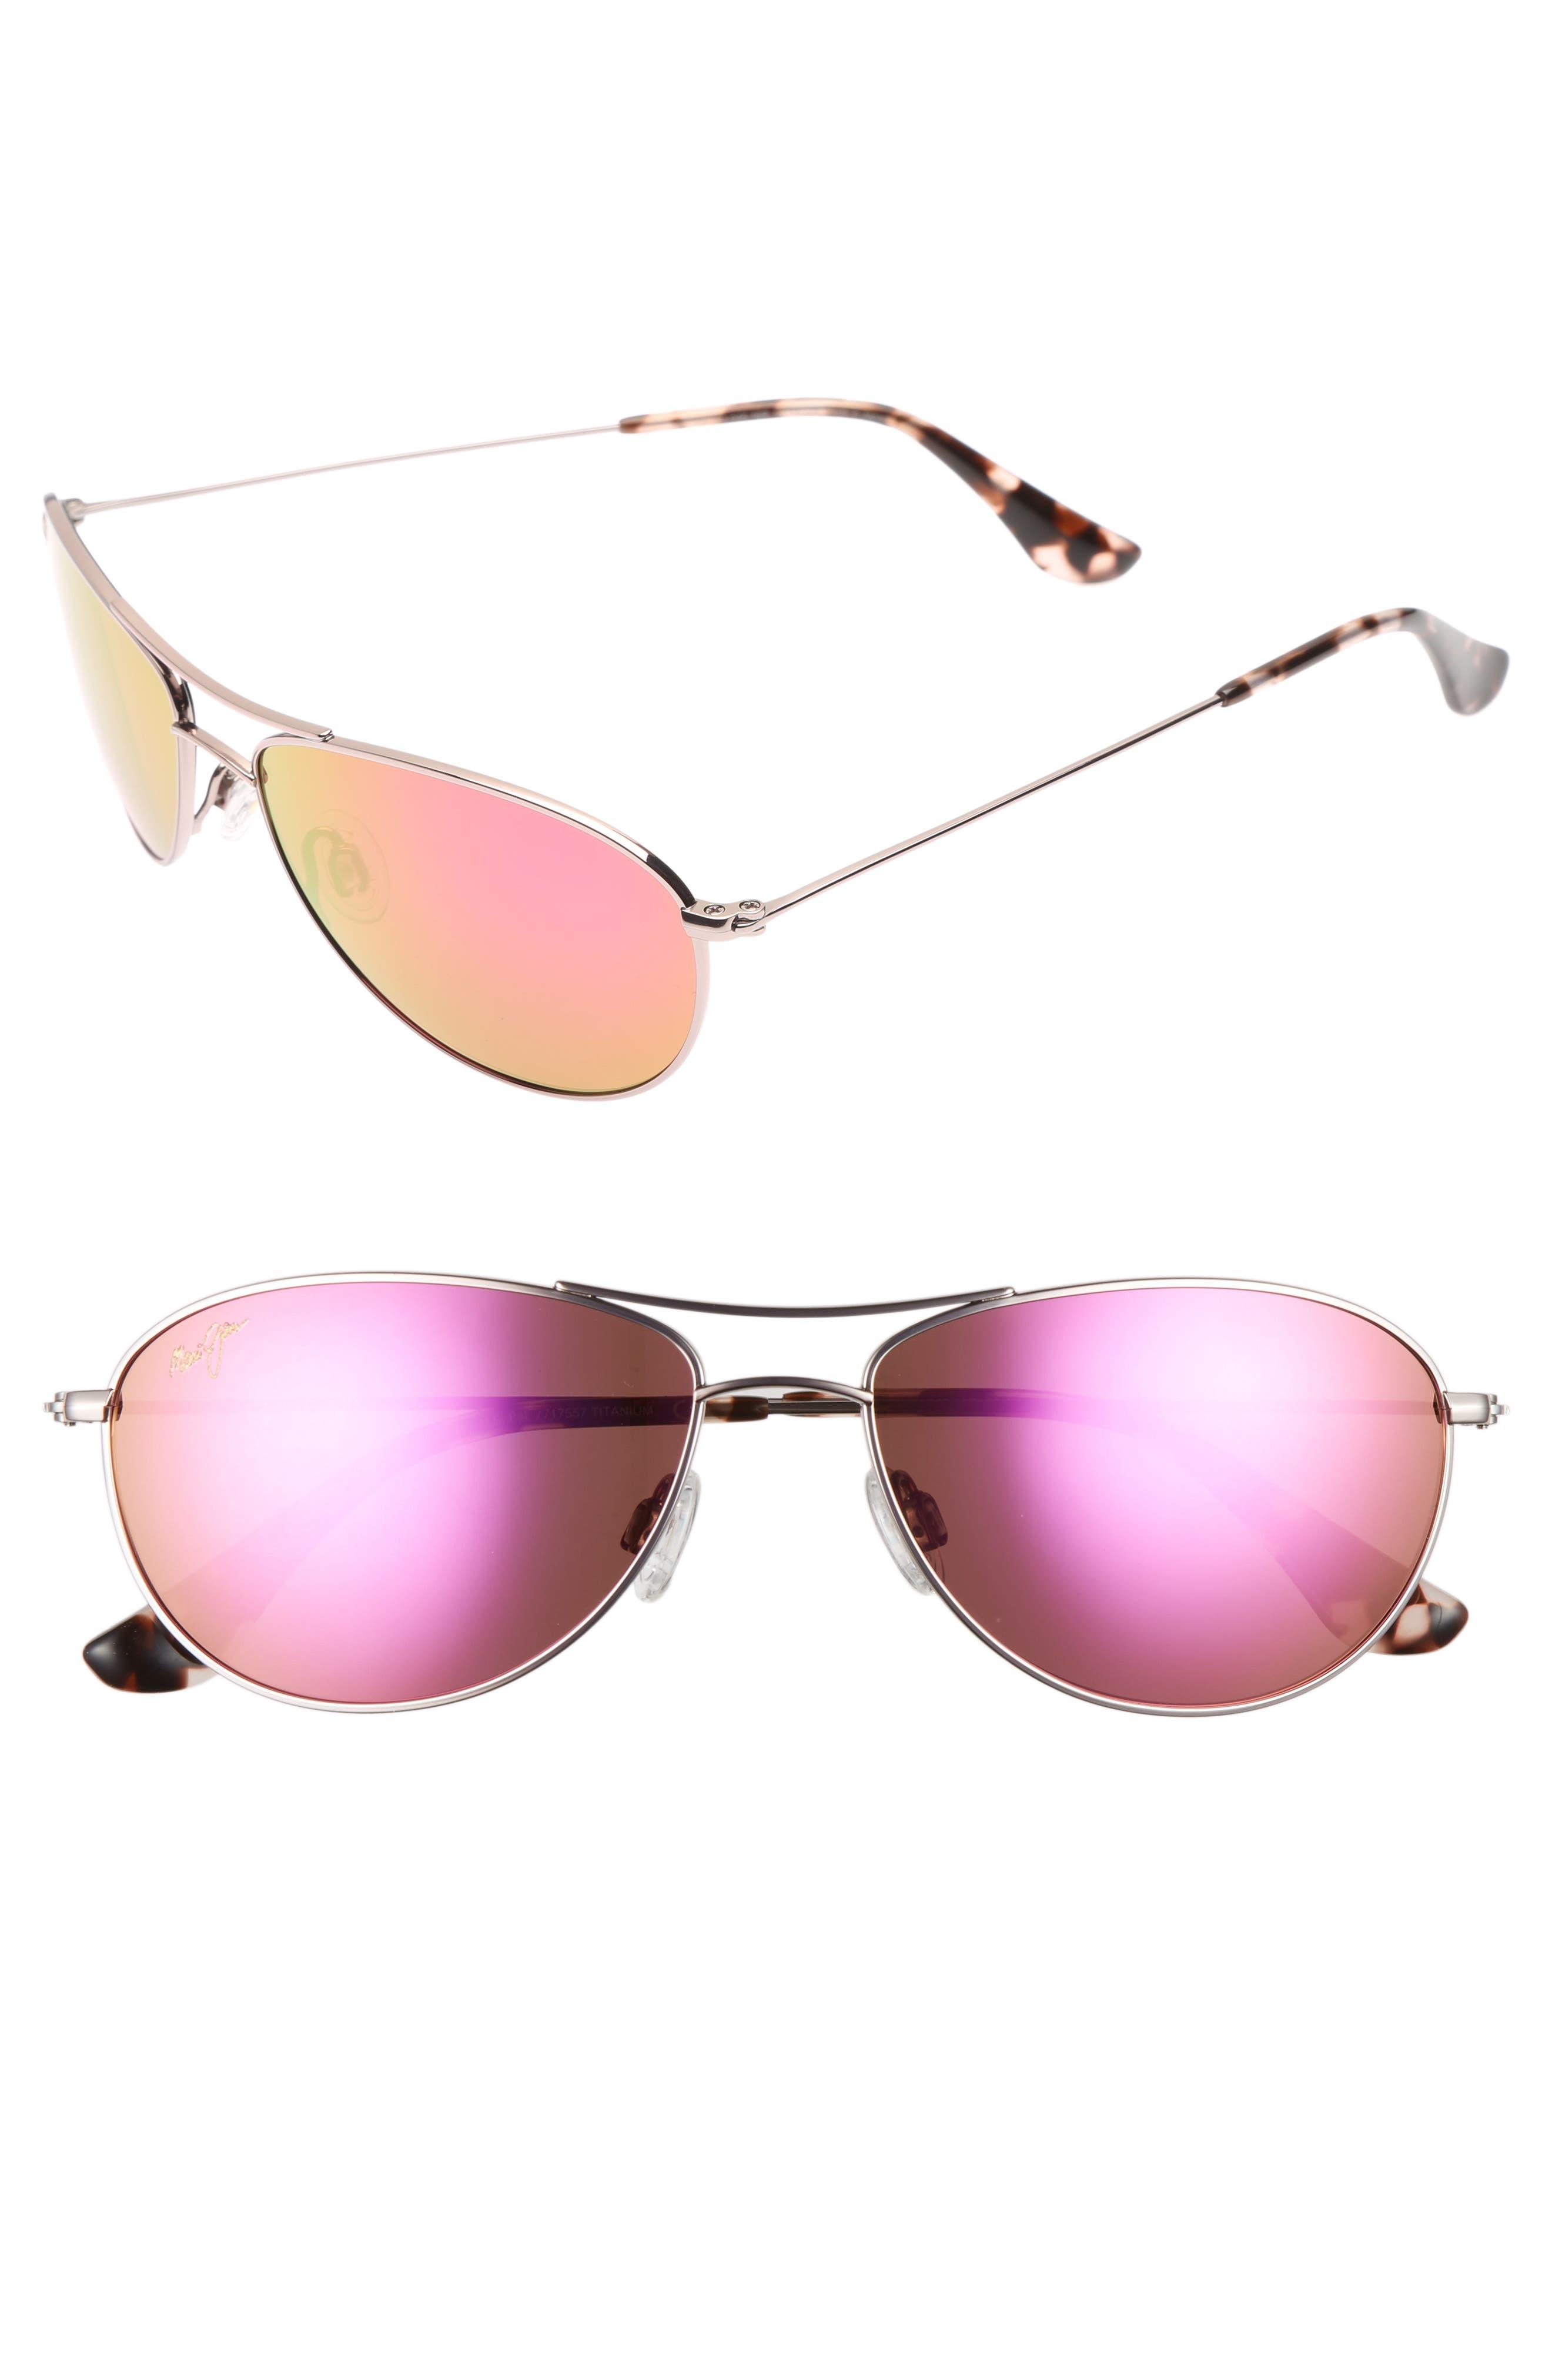 Baby Beach 56mm Mirrored PolarizedPlus2<sup>®</sup> Aviator Sunglasses,                             Main thumbnail 1, color,                             ROSE GOLD/ MAUI SUNRISE